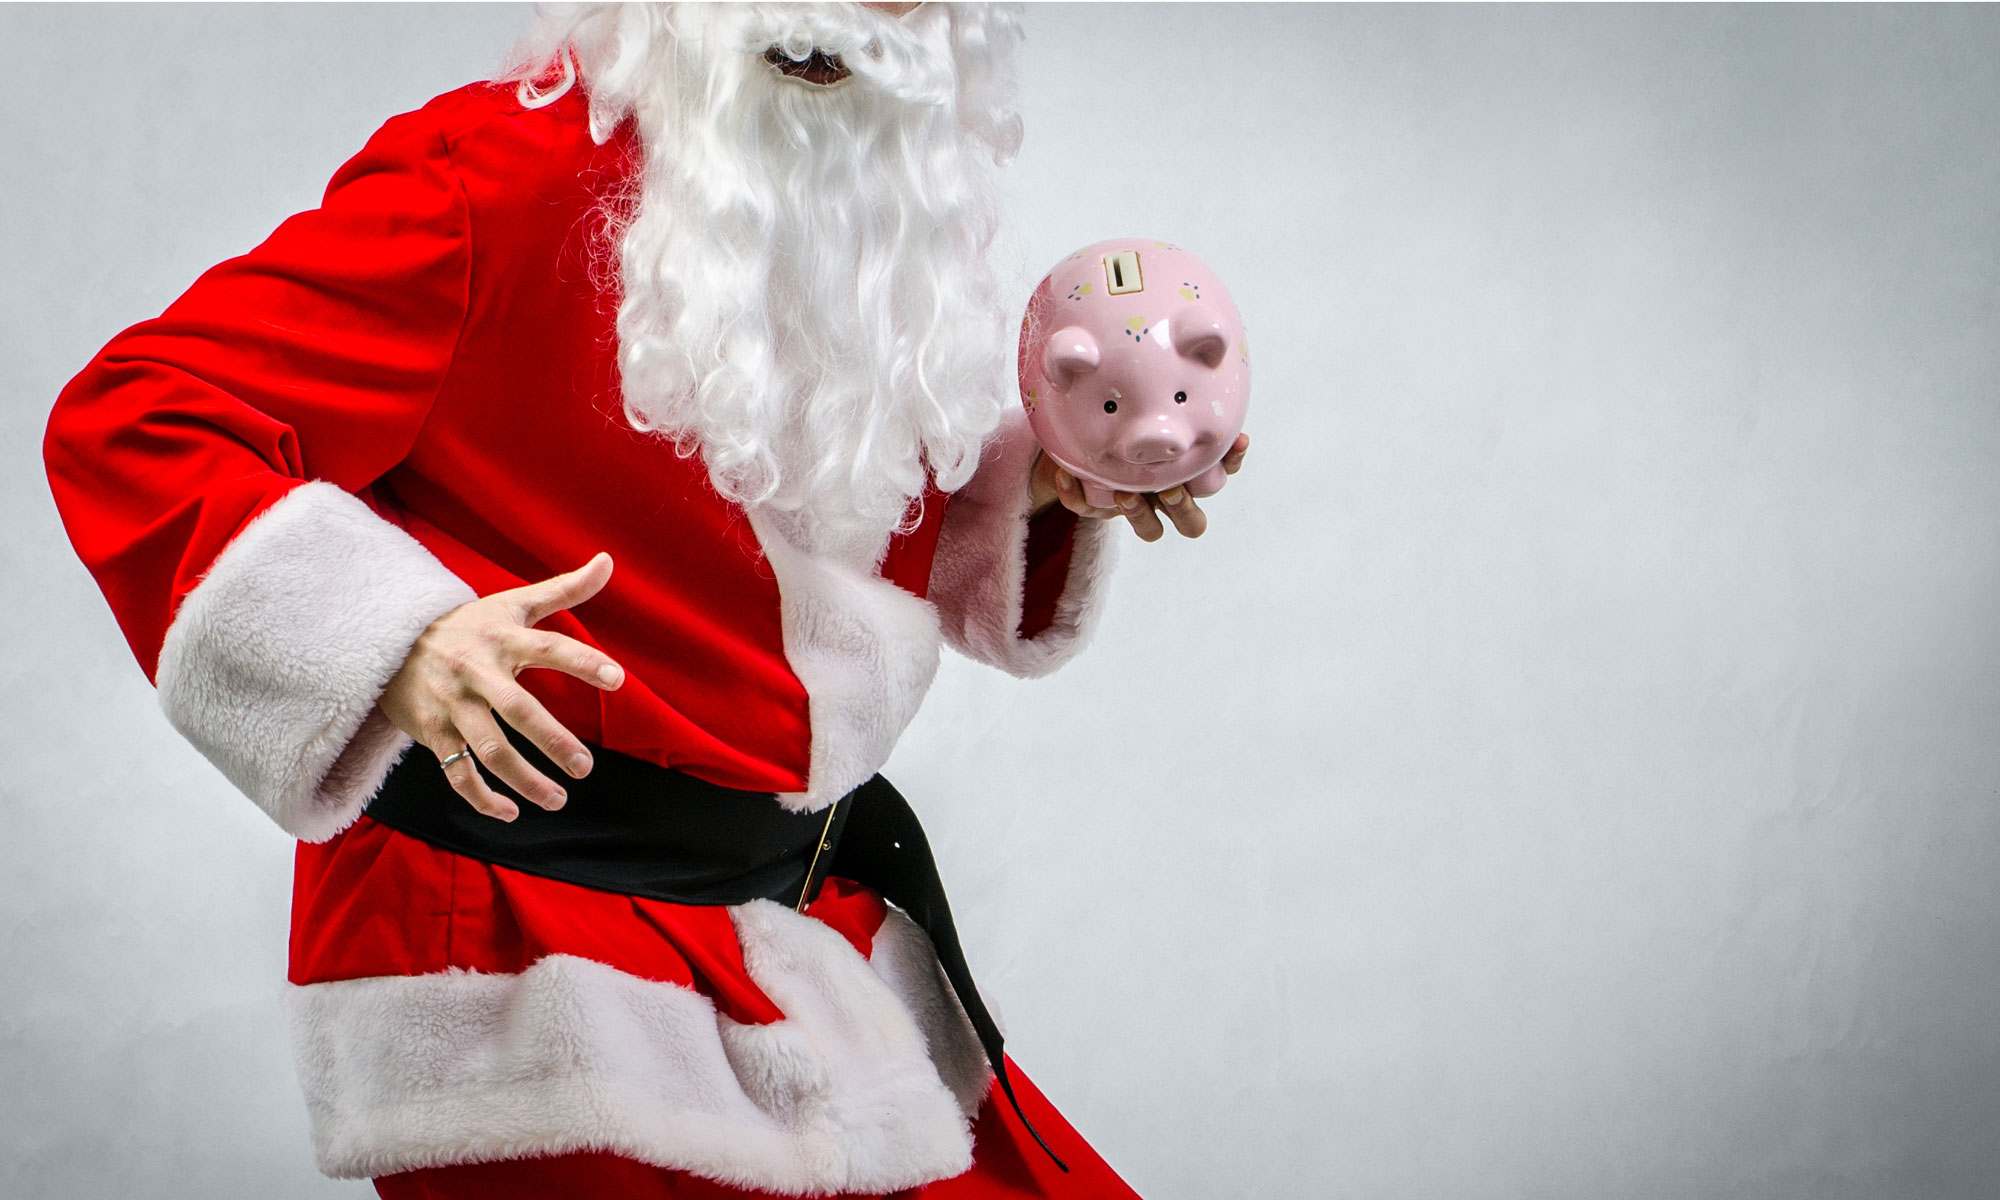 Santa holding a piggy bank